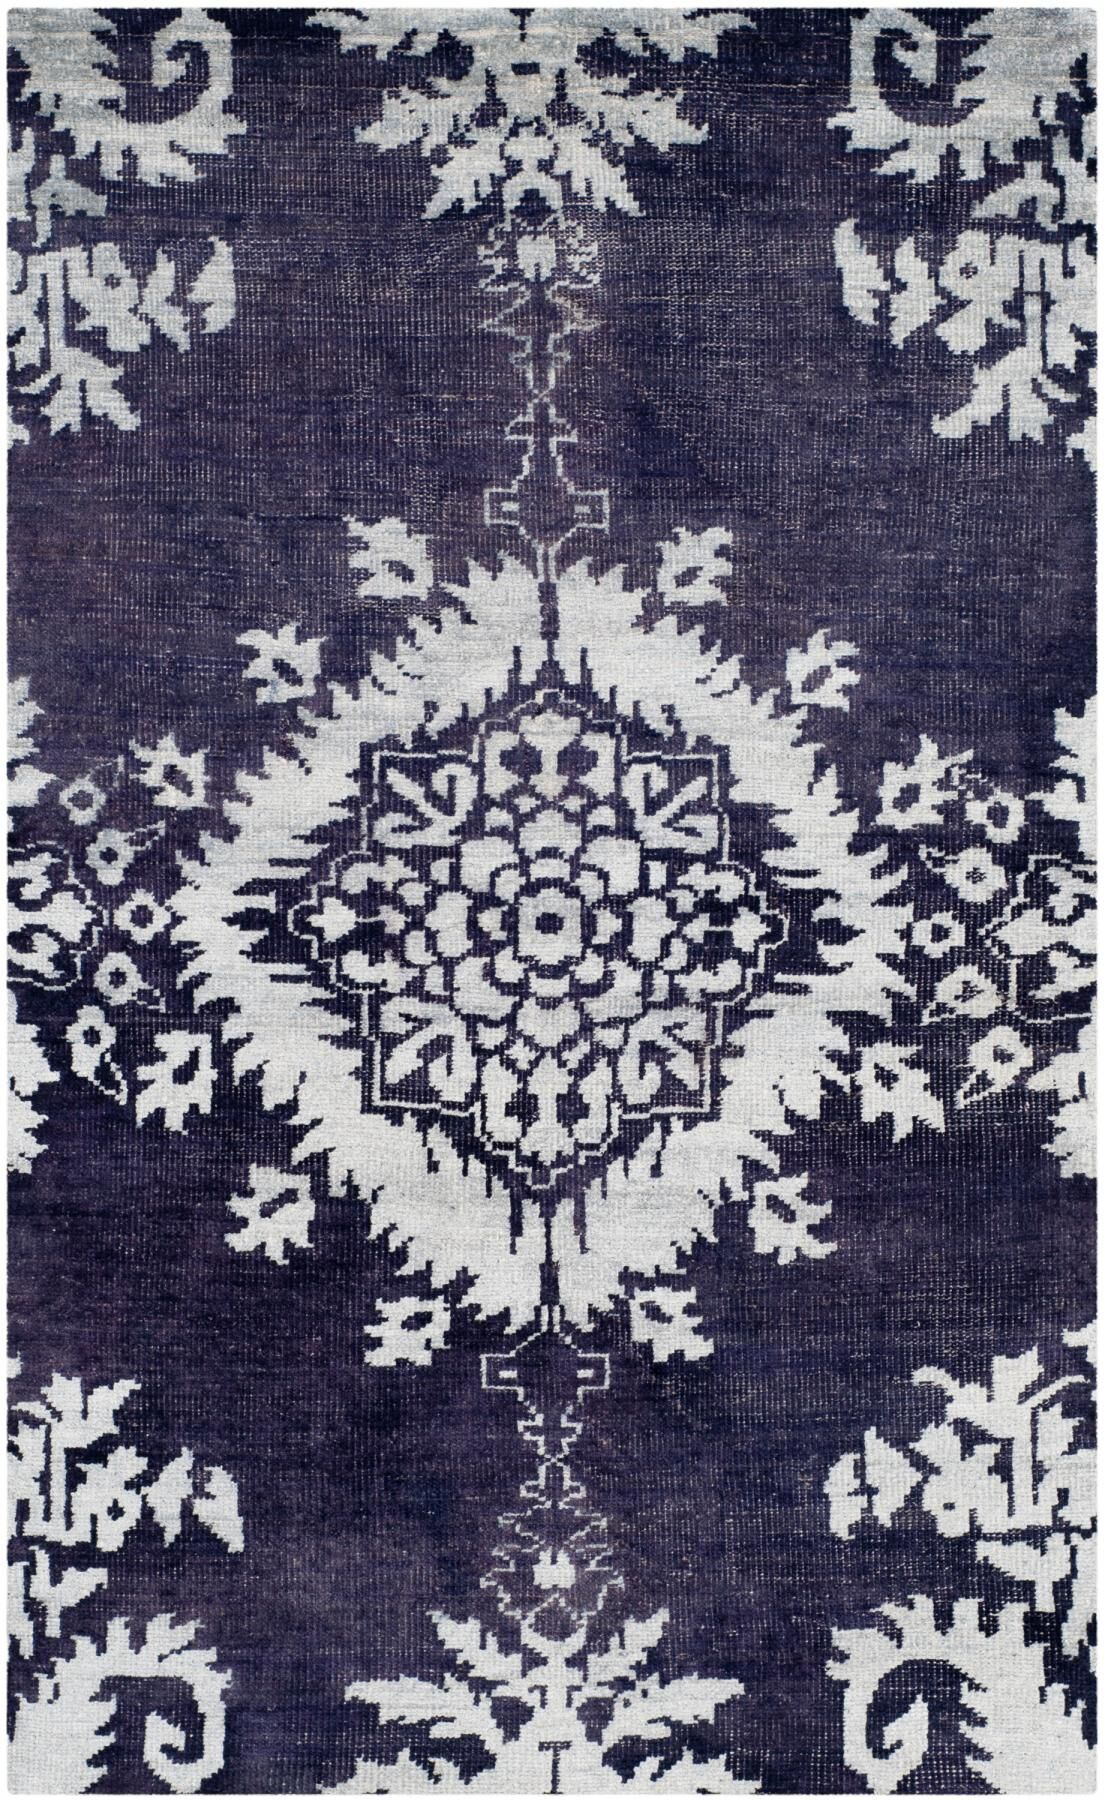 Moulouya Hand-Knotted Deep Purple Area Rug Rug Size: Rectangle 5' x 8'